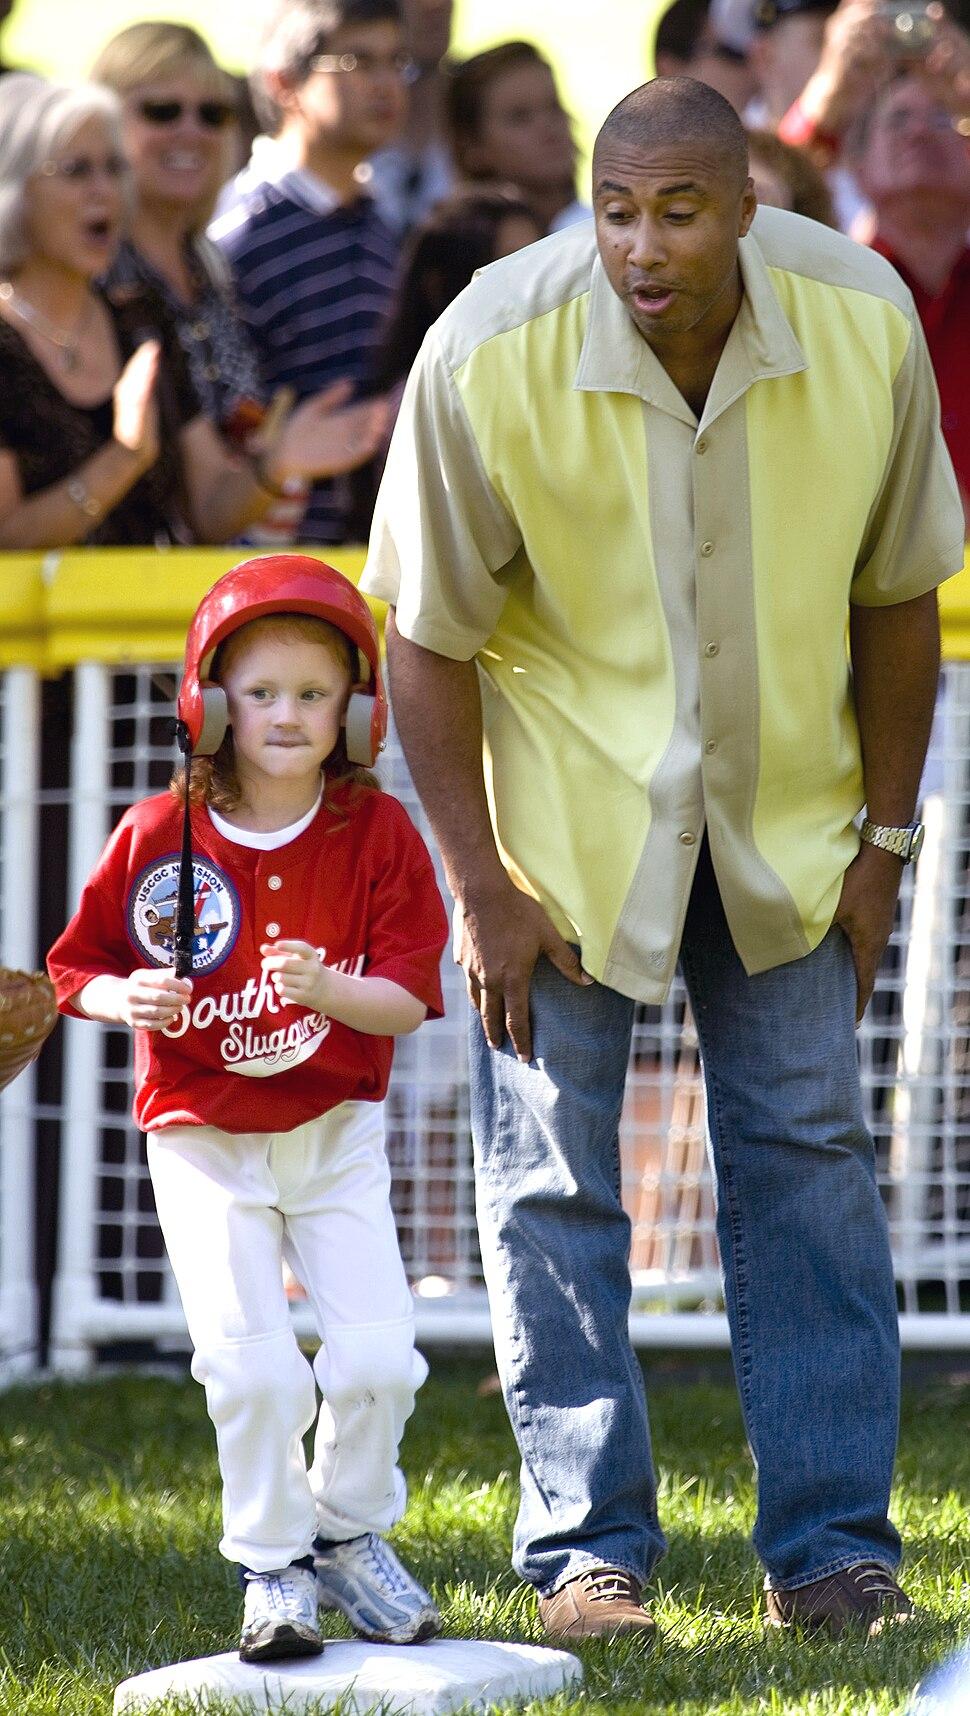 New York Yankee great Bernie Williams coaches Cassie Frank, 2008